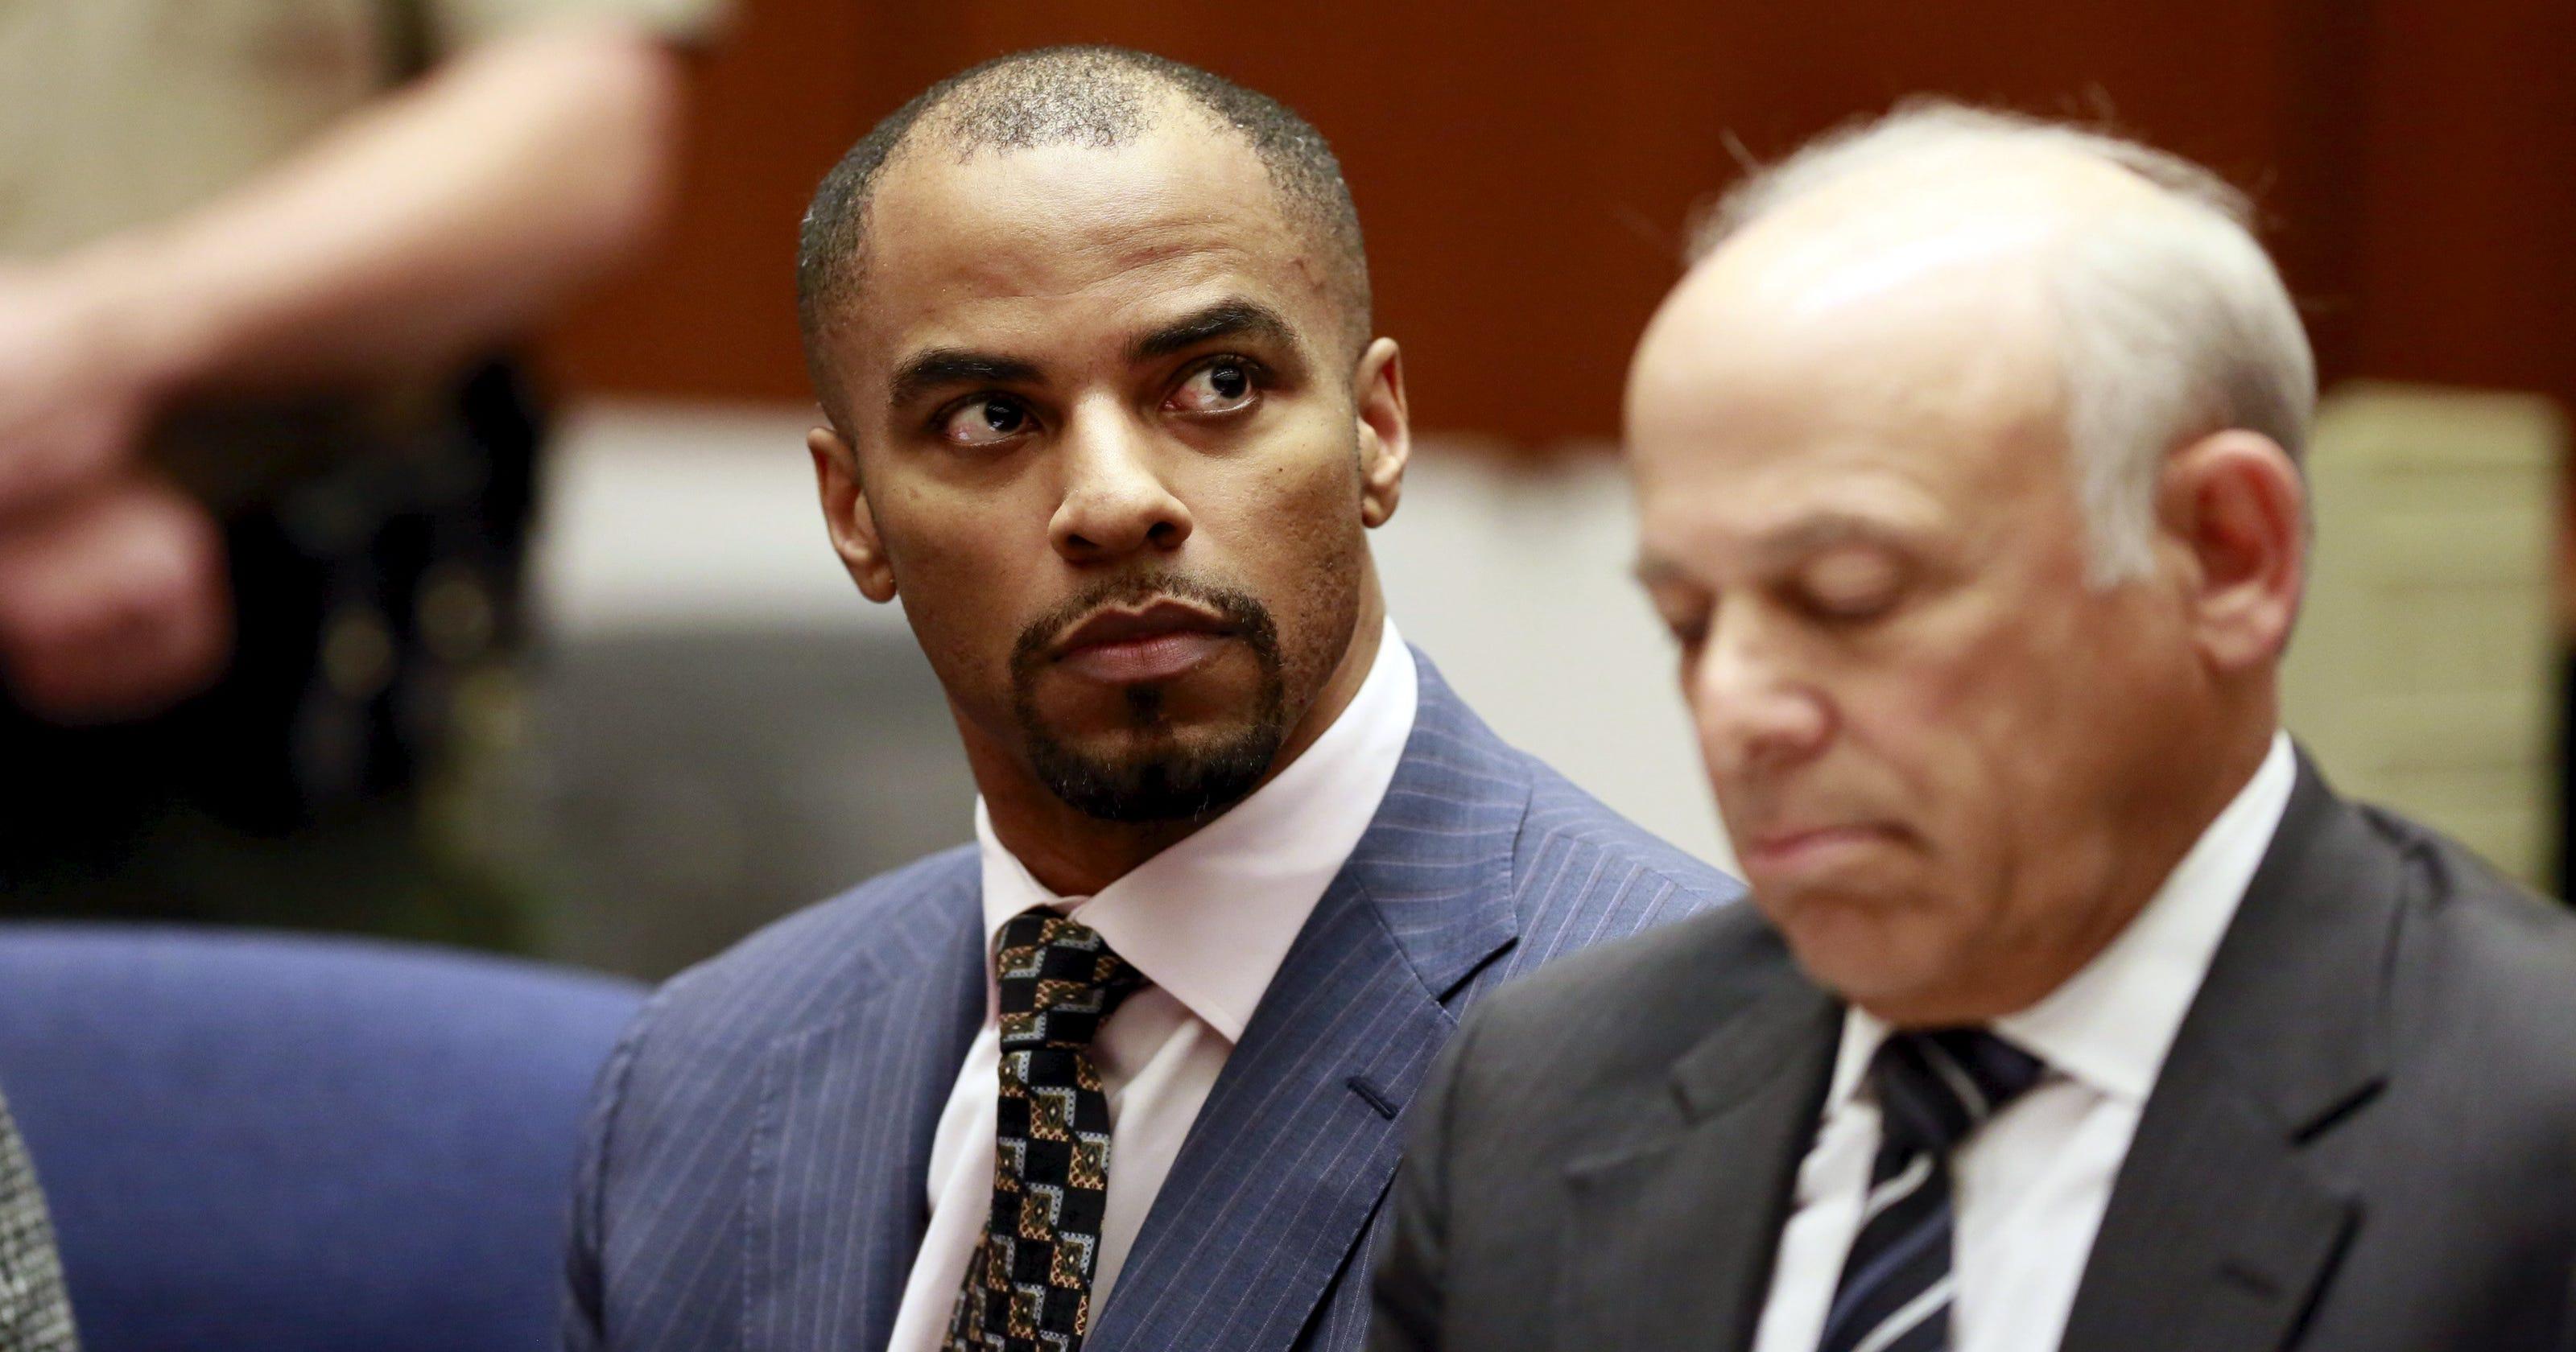 4e23da305bb Darren Sharper sentenced to 9 years for rape